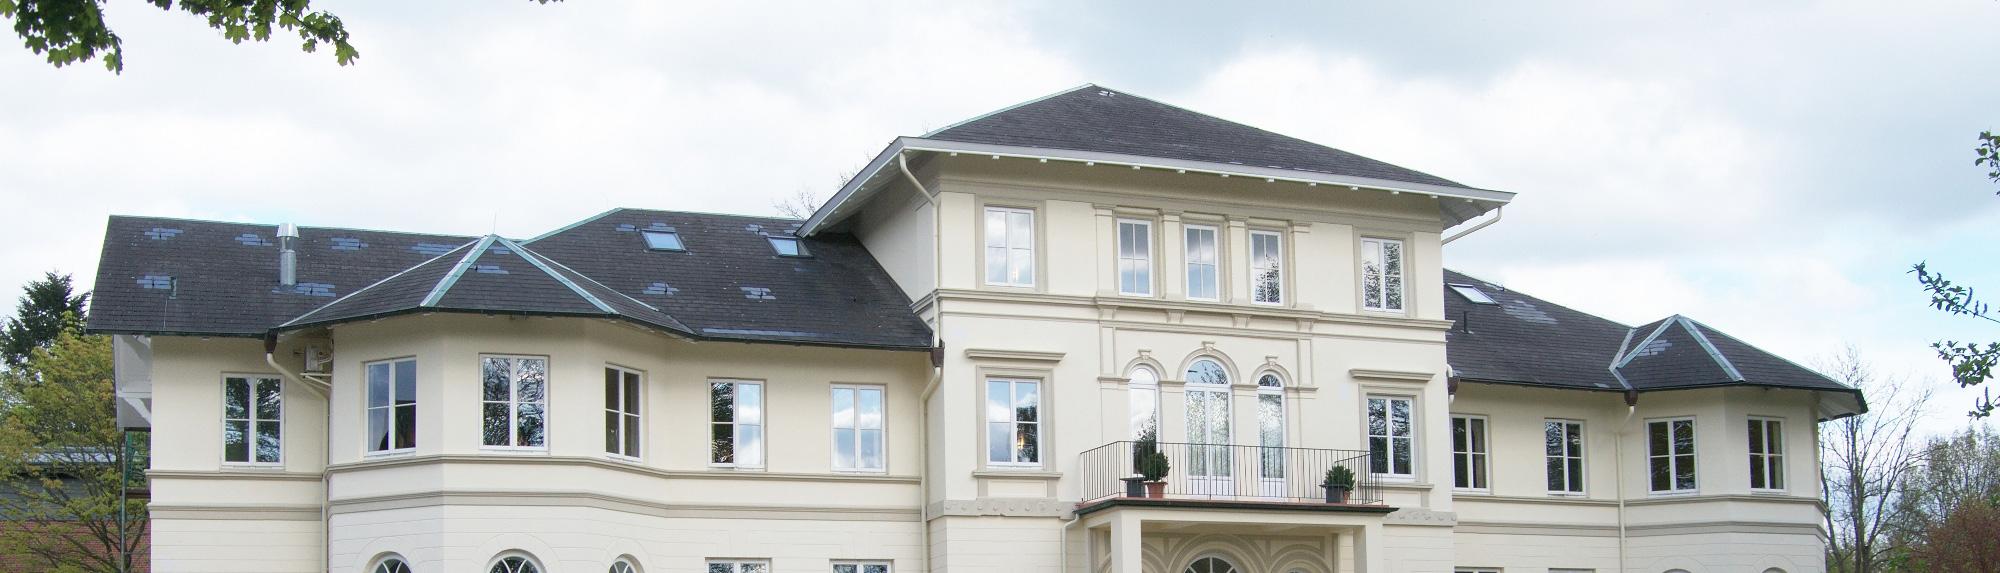 Gutshaus Berne